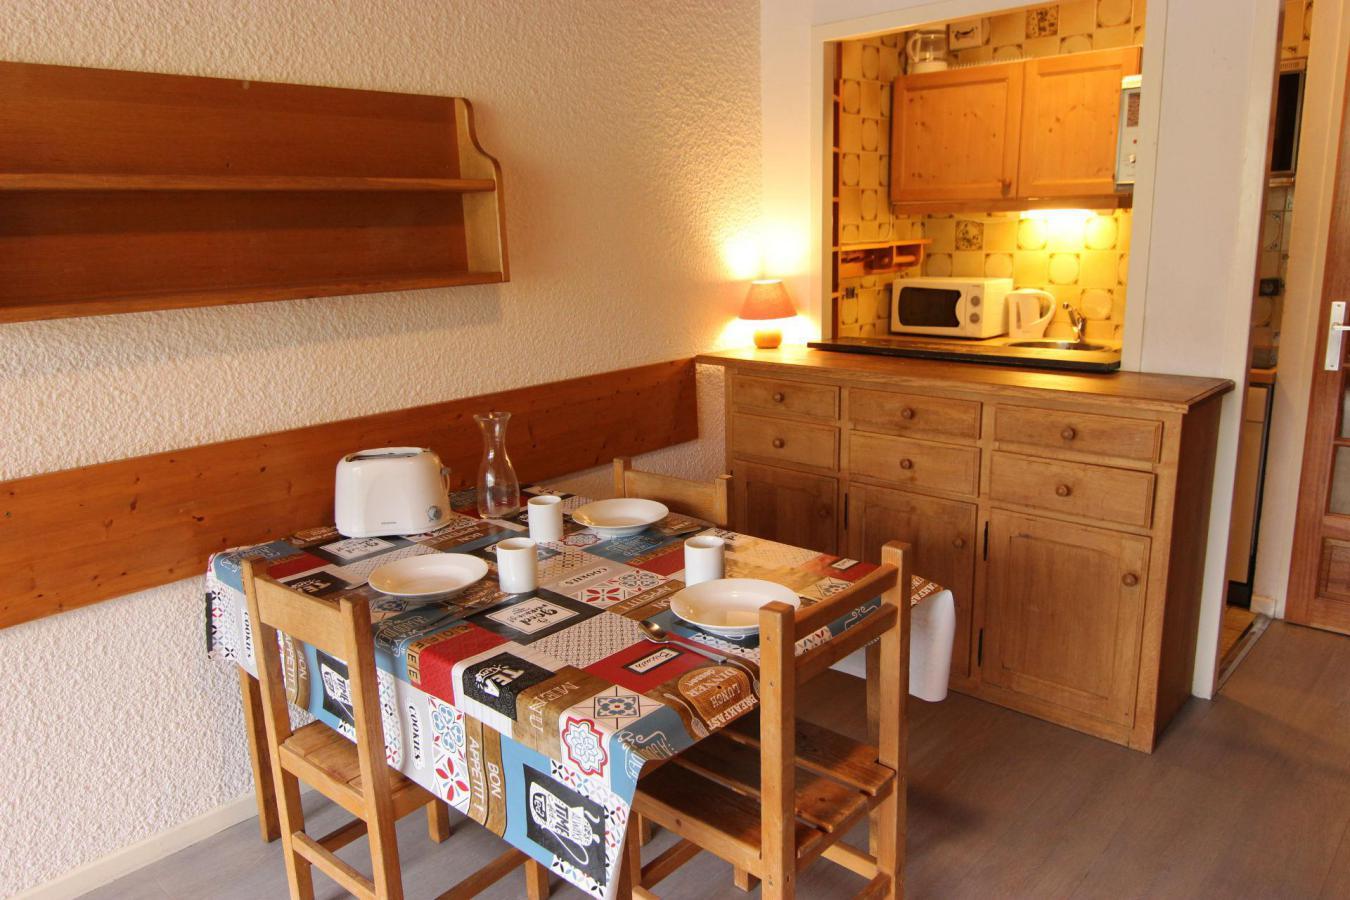 Location au ski Studio 4 personnes (U7) - Residence Le Serac - Val Thorens - Kitchenette